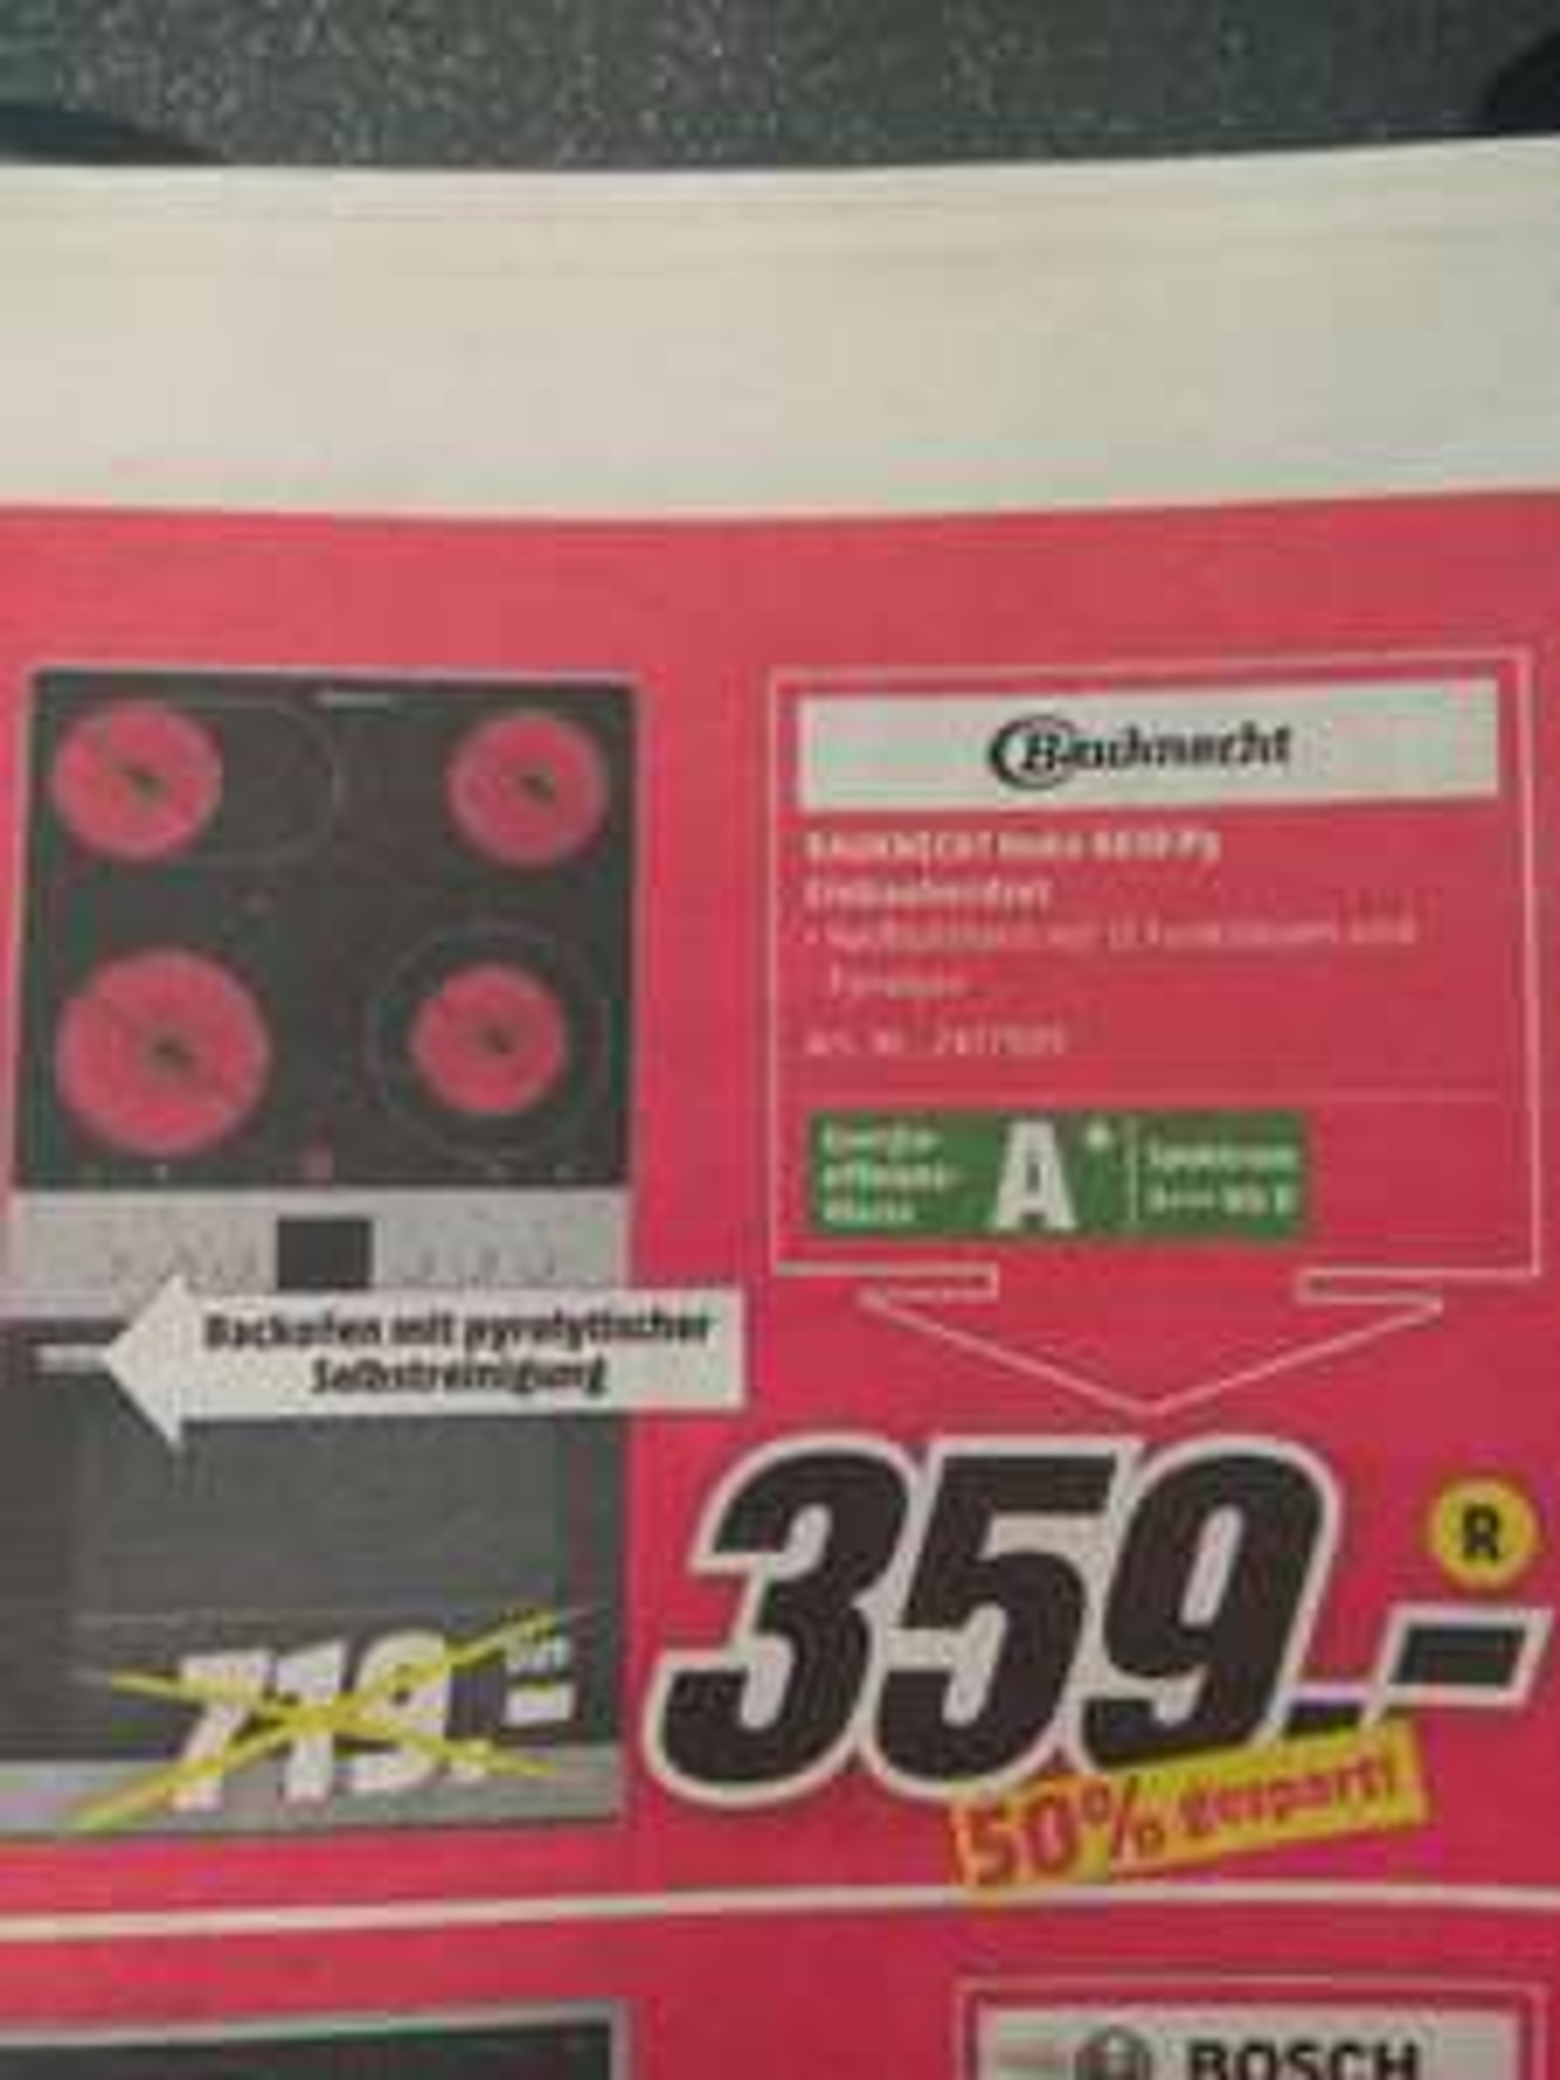 kassel media markt bauknecht heko 4610 py tiefstpreis. Black Bedroom Furniture Sets. Home Design Ideas